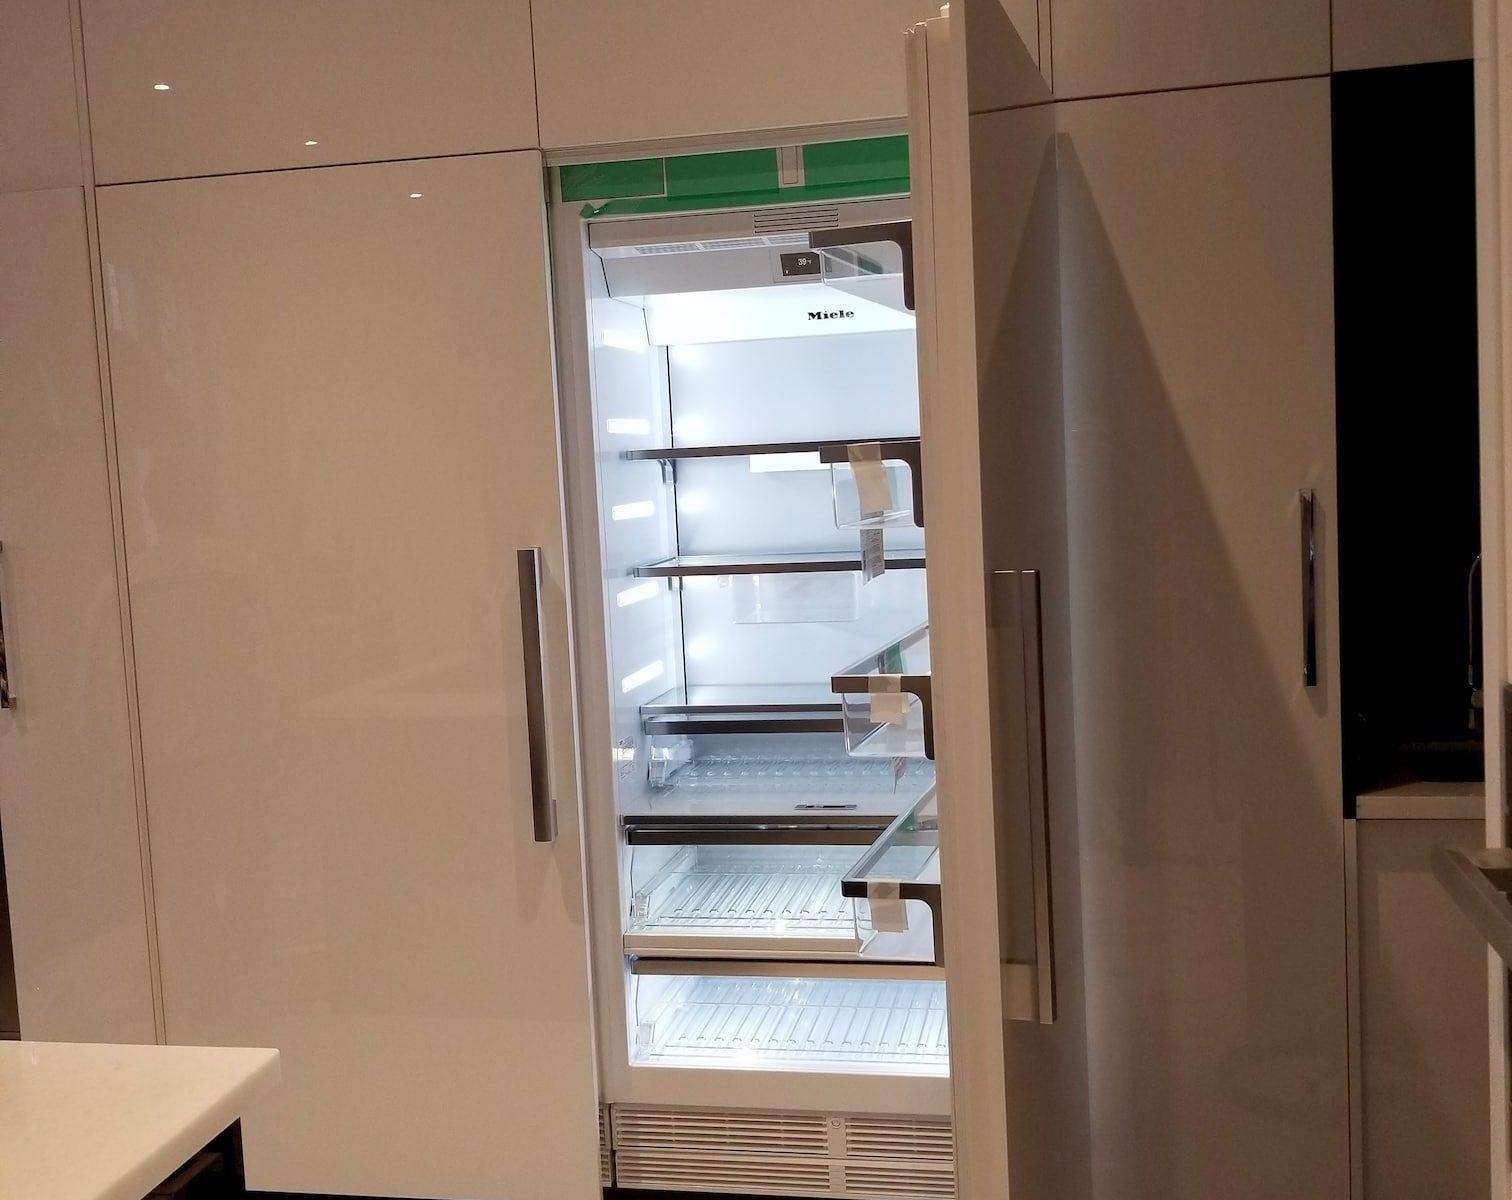 fridge repair service toronto